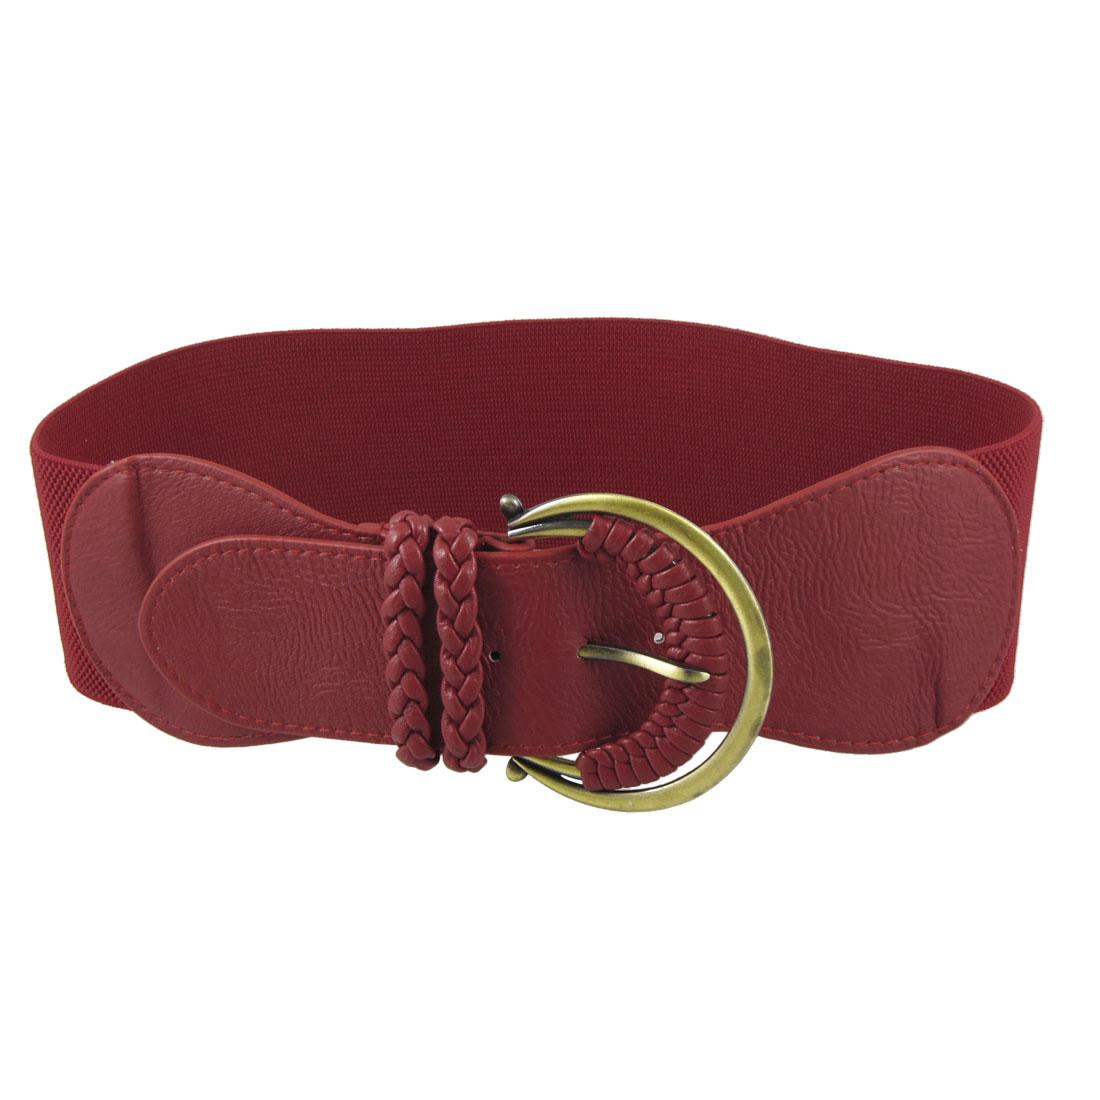 Lady Braid Faux Leather Metal Single Buckle Wide Red Elastic Cinch Waist Belt